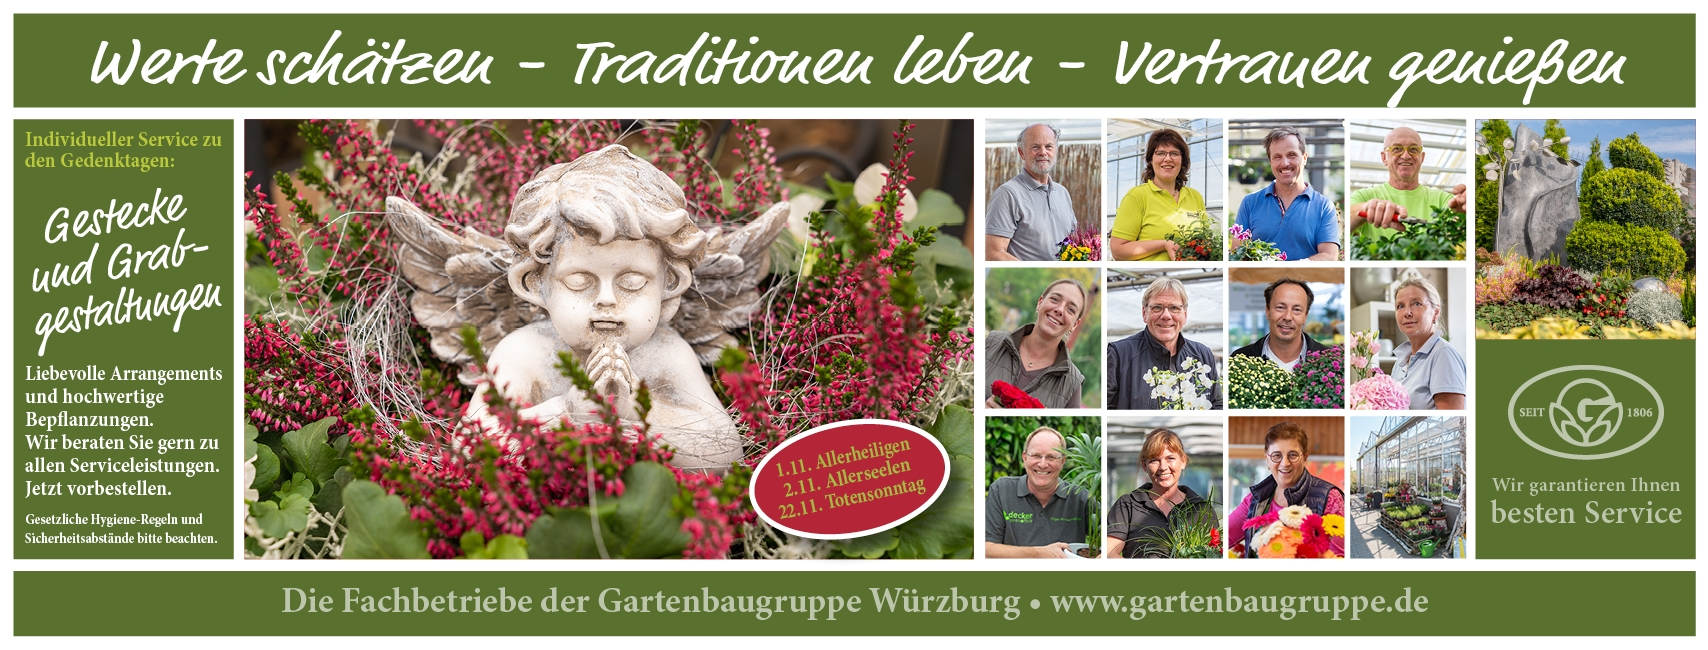 Gartenbaugruppe Banner Allerheiligen Friedhof Facebook Home 820x312px